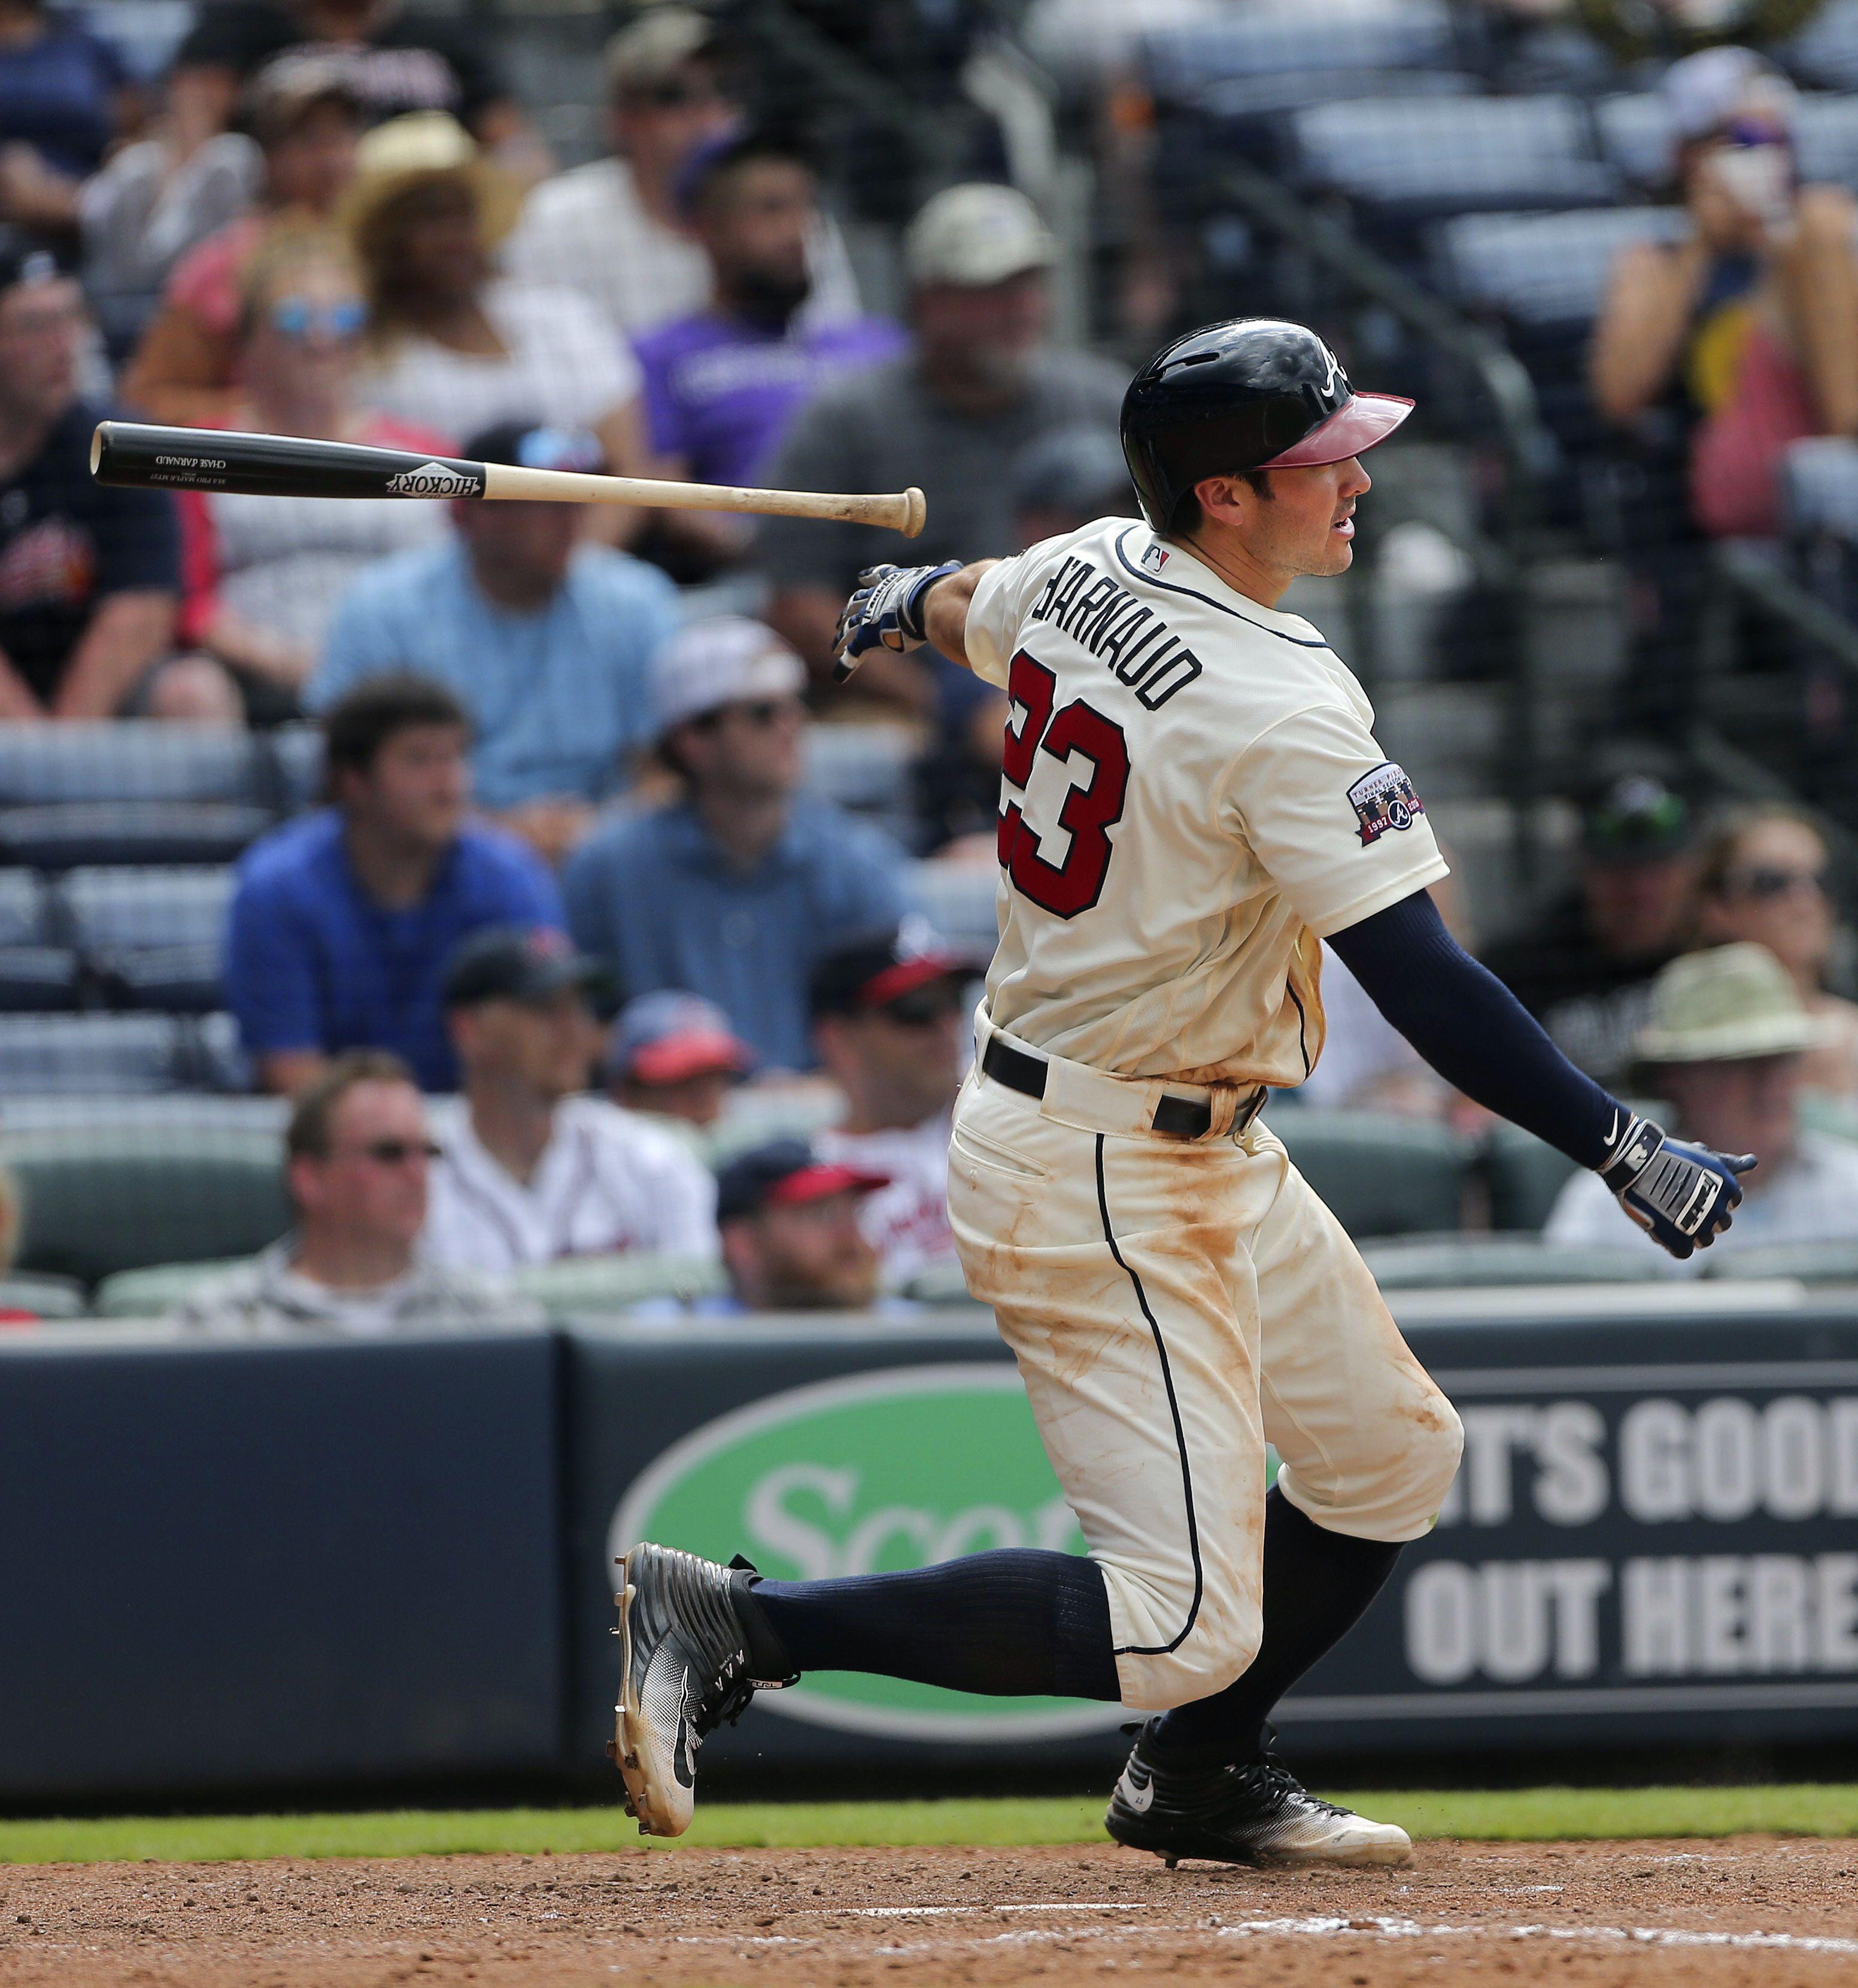 Atlanta Braves shortstop Chase d'Arnaud follows through on